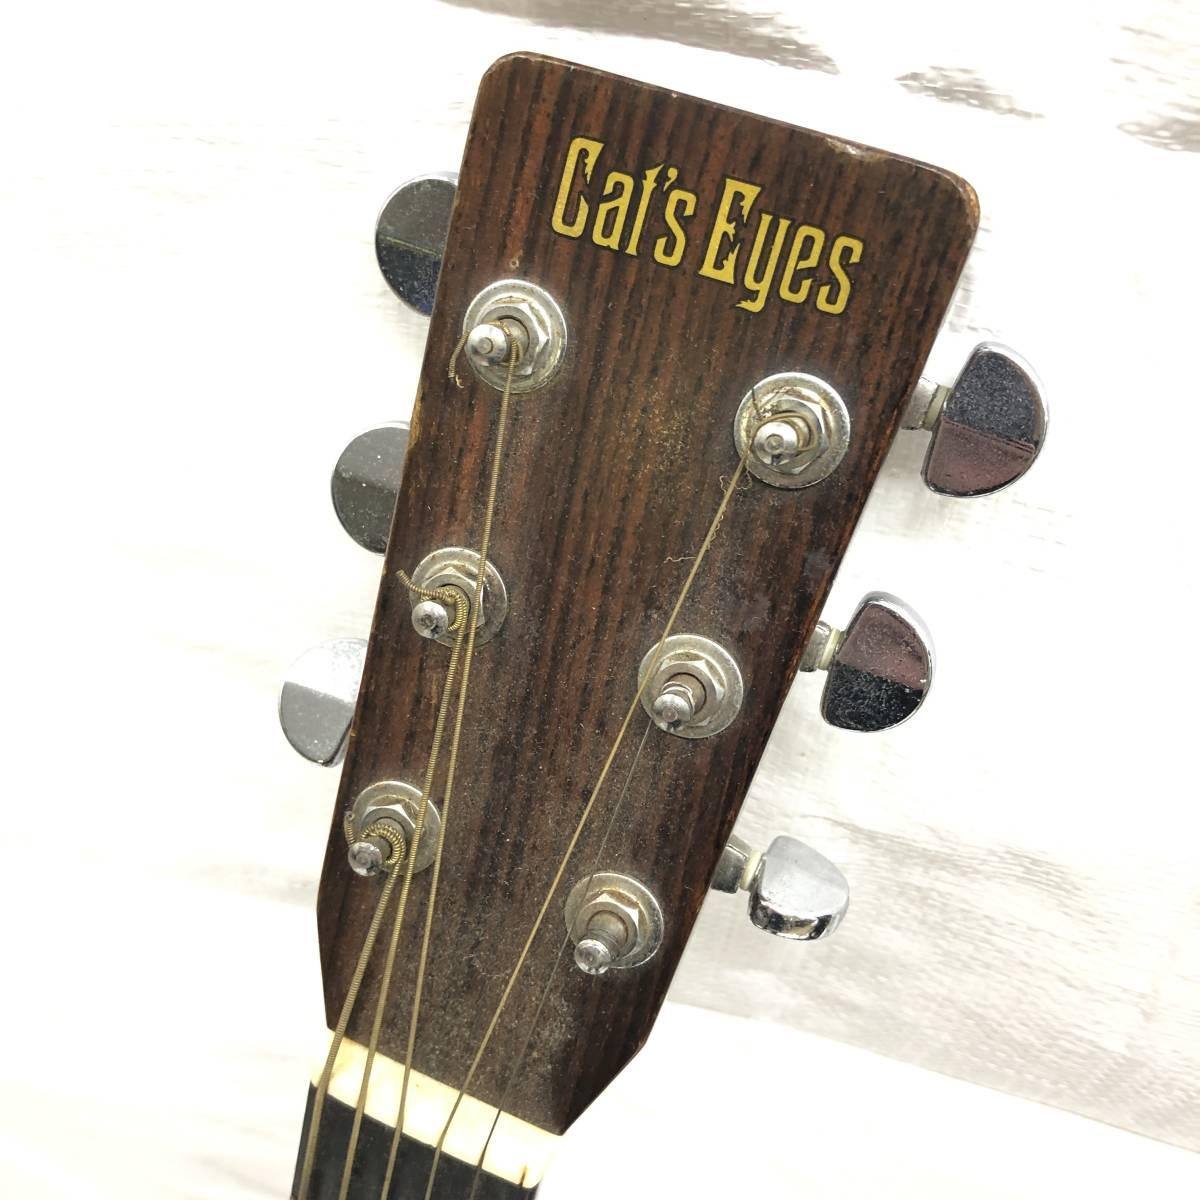 【SS】TOKAI トーカイ 東海楽器 Cat's Eyes MODEL CE500CF キャッツアイ ギターケース ハードケース 動作未確認 中古 レトロ ヴィンテージ_画像4